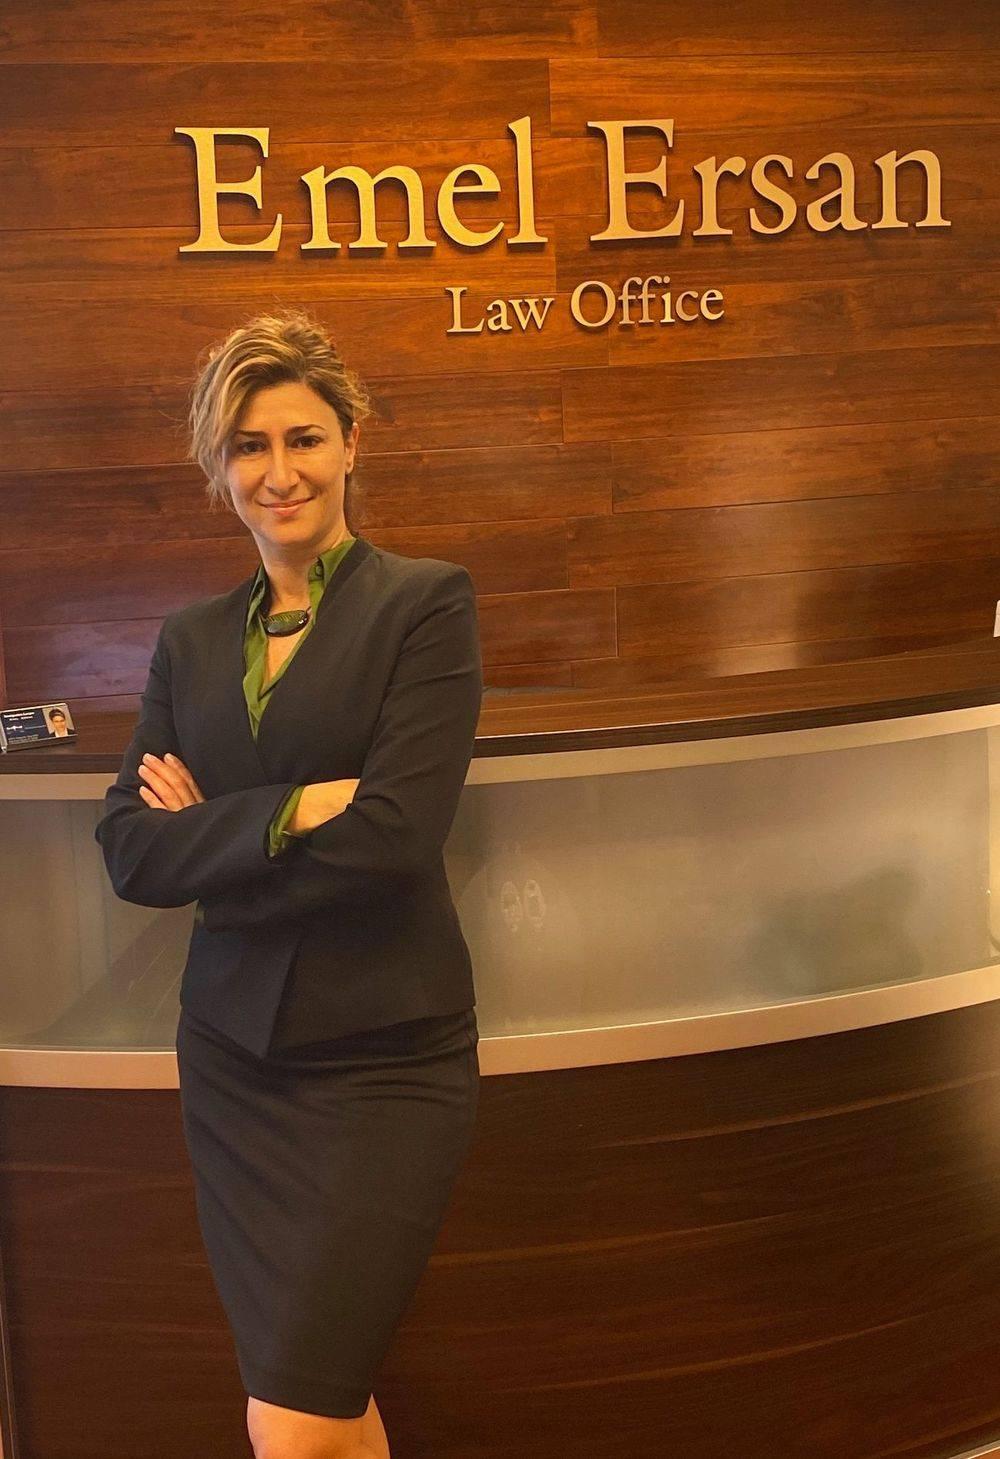 Emel Ersan in her office's lobby